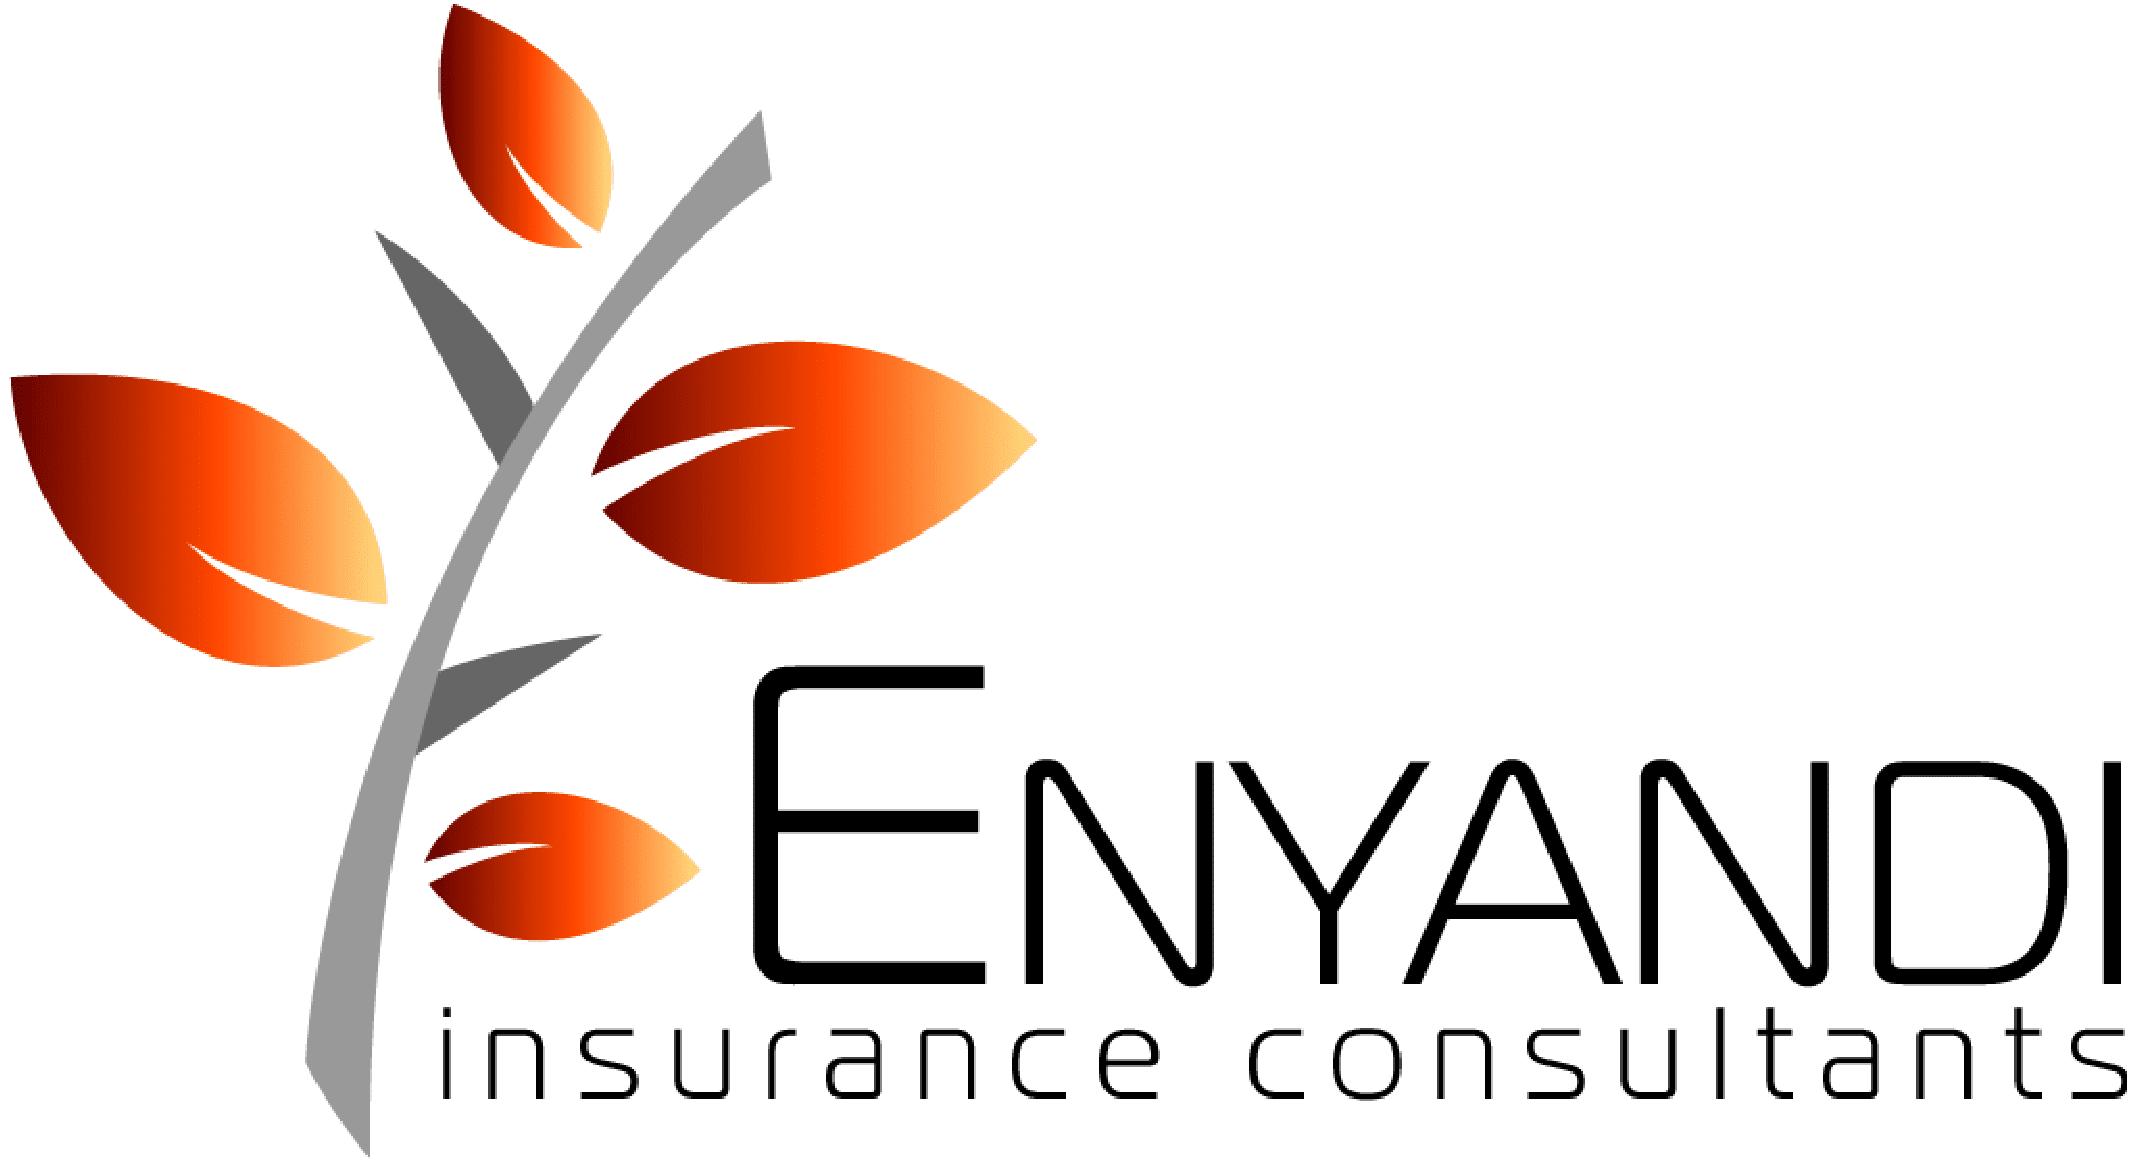 Enyandi Insurance Consultants